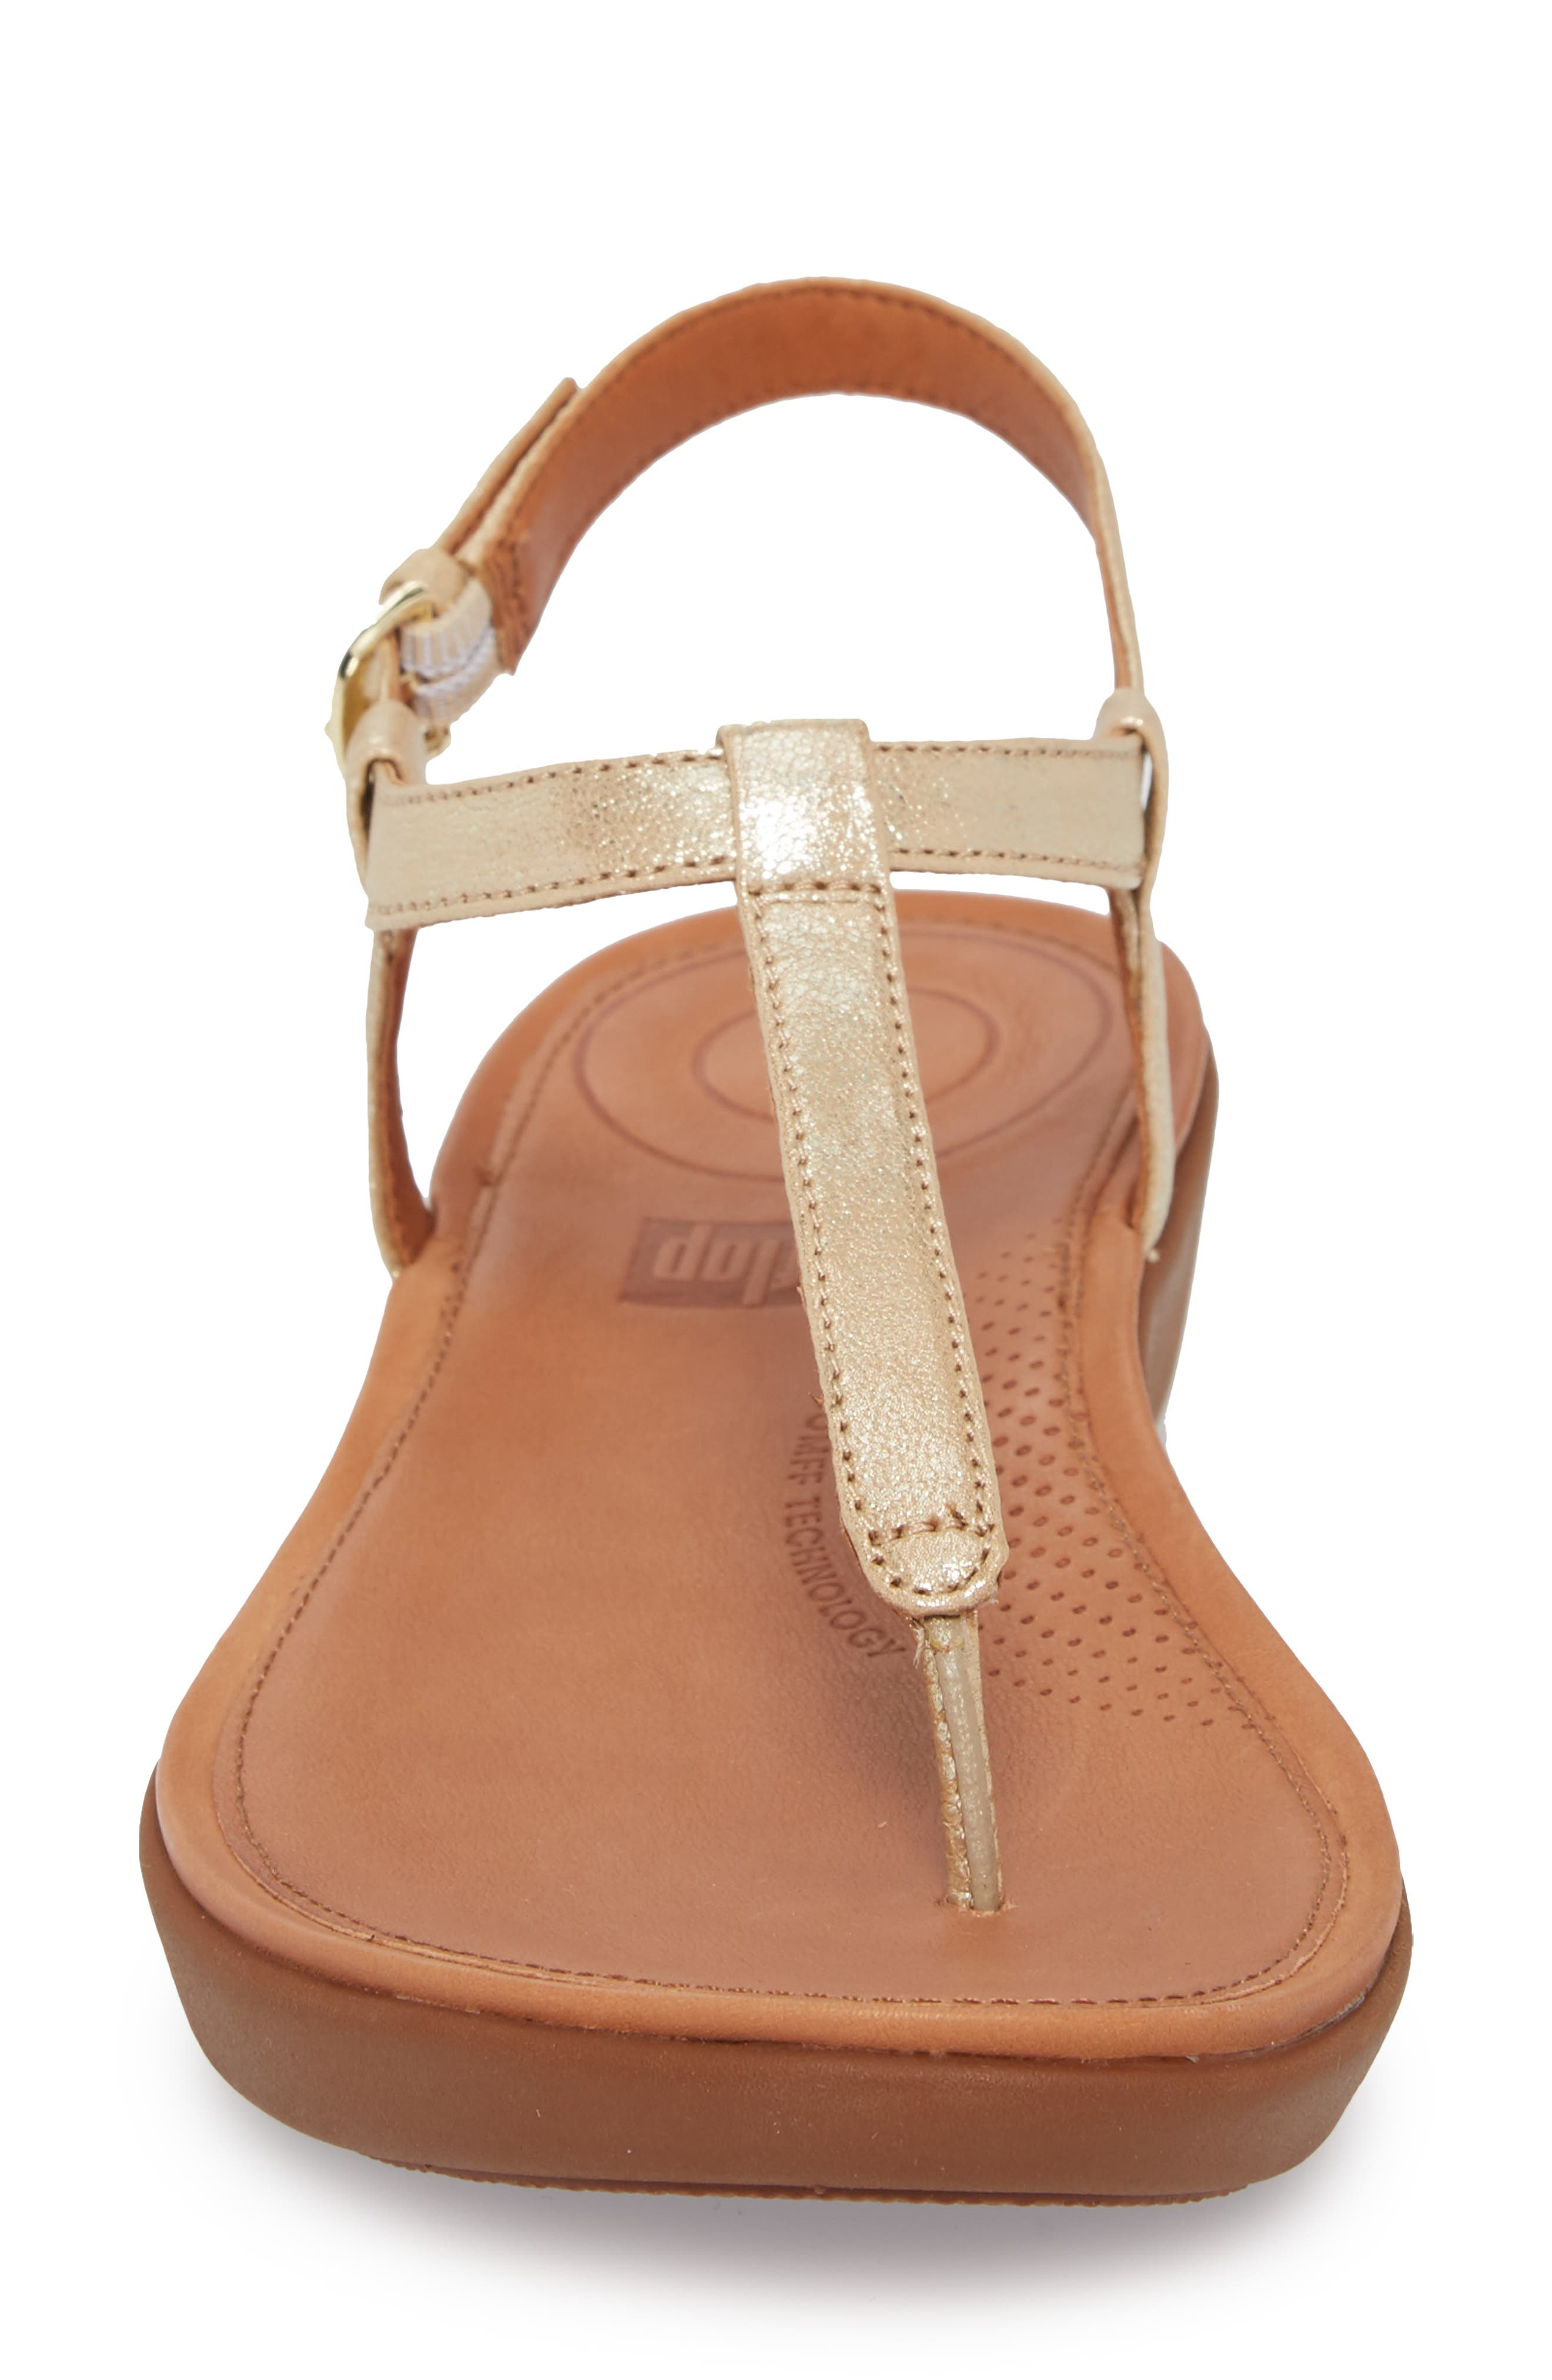 Tia Thong Sandal,                             Alternate thumbnail 4, color,                             Pale Gold Leather